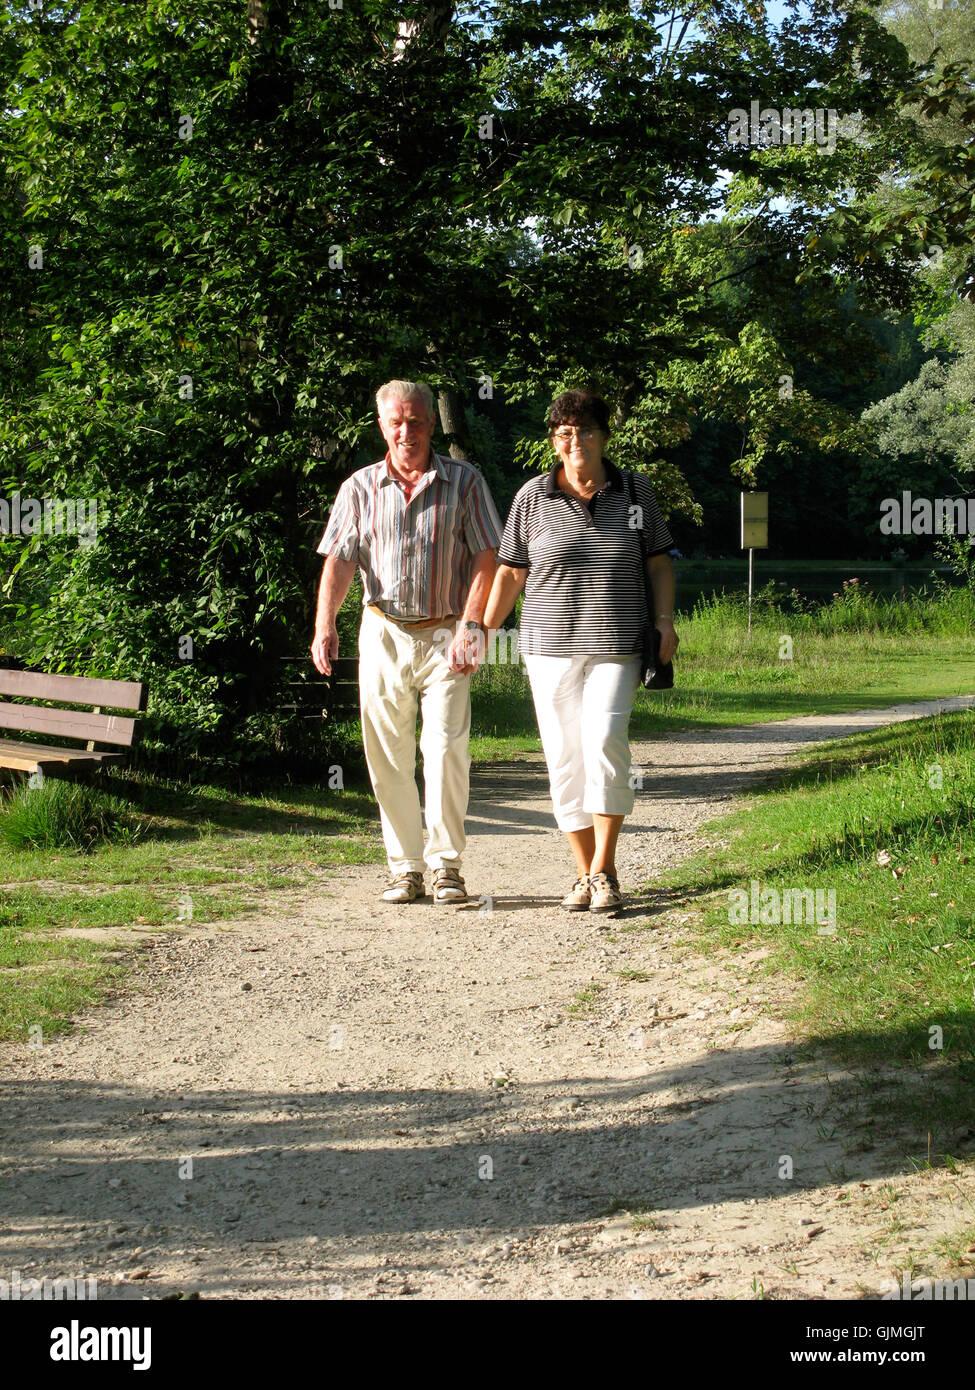 park walk pension - Stock Image